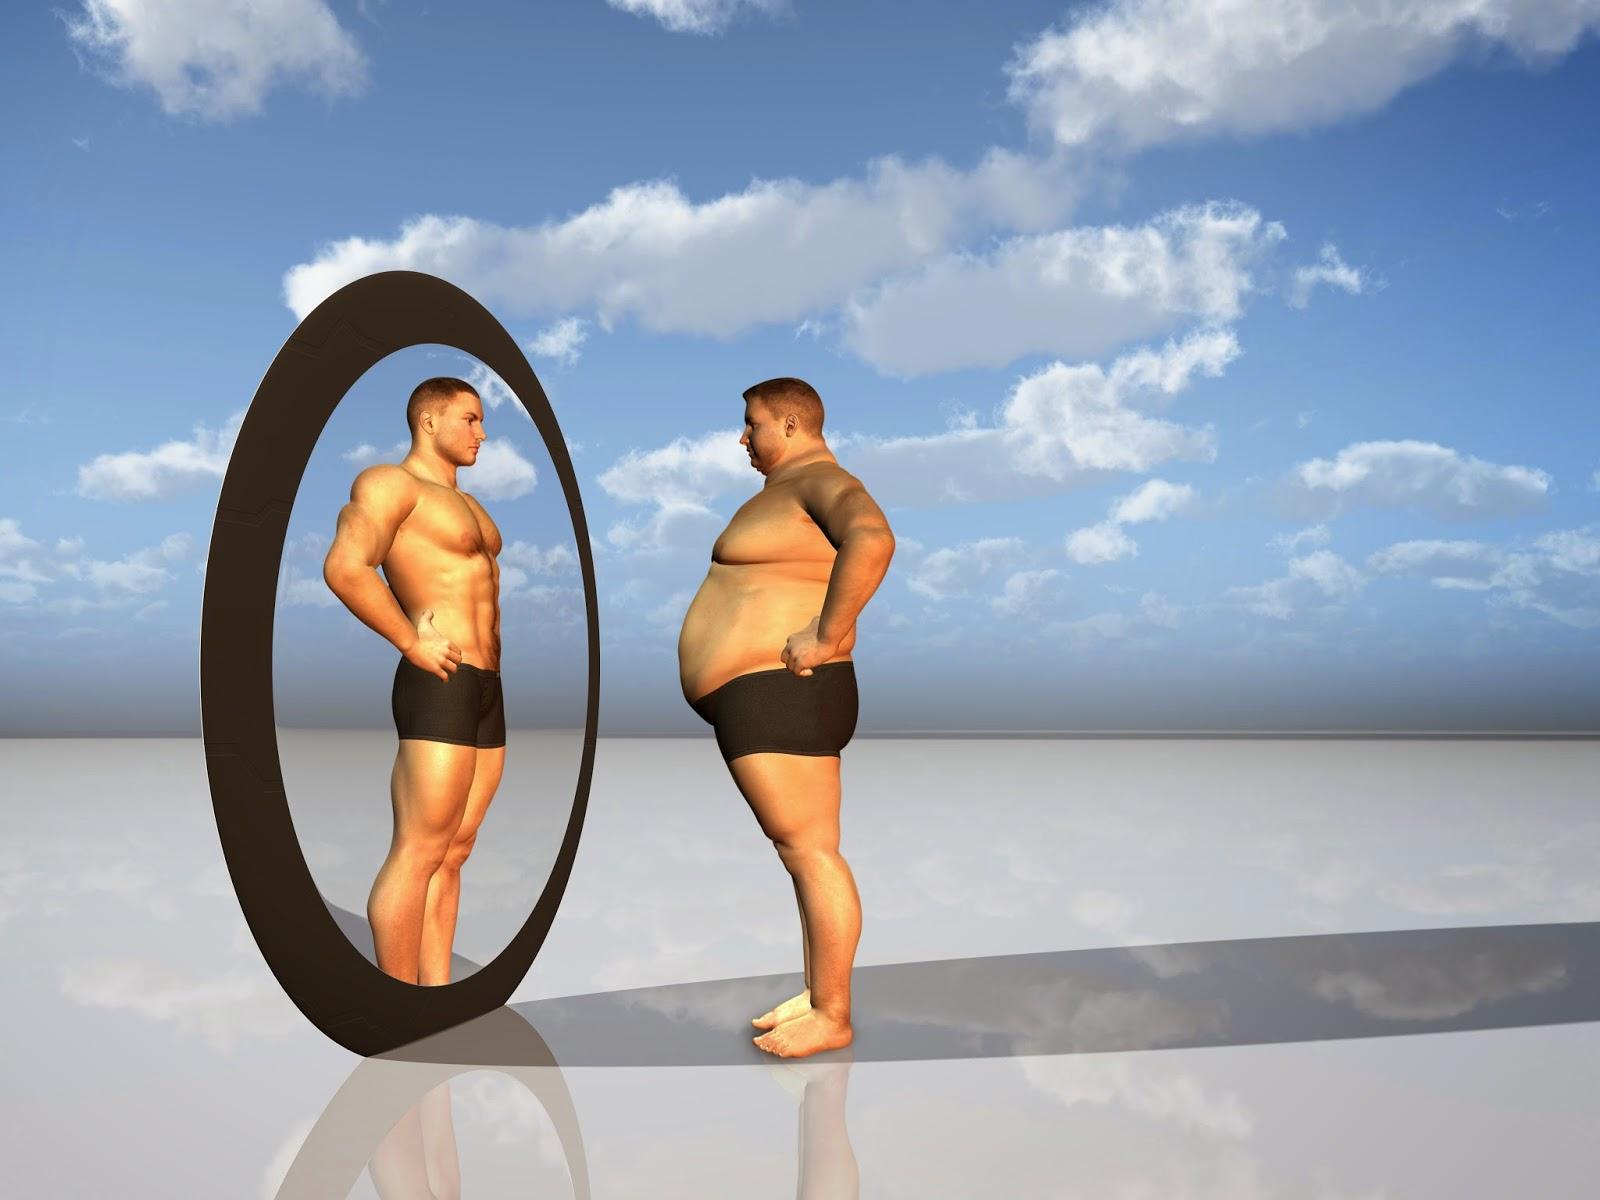 6 Steps to Improving Self-Esteem